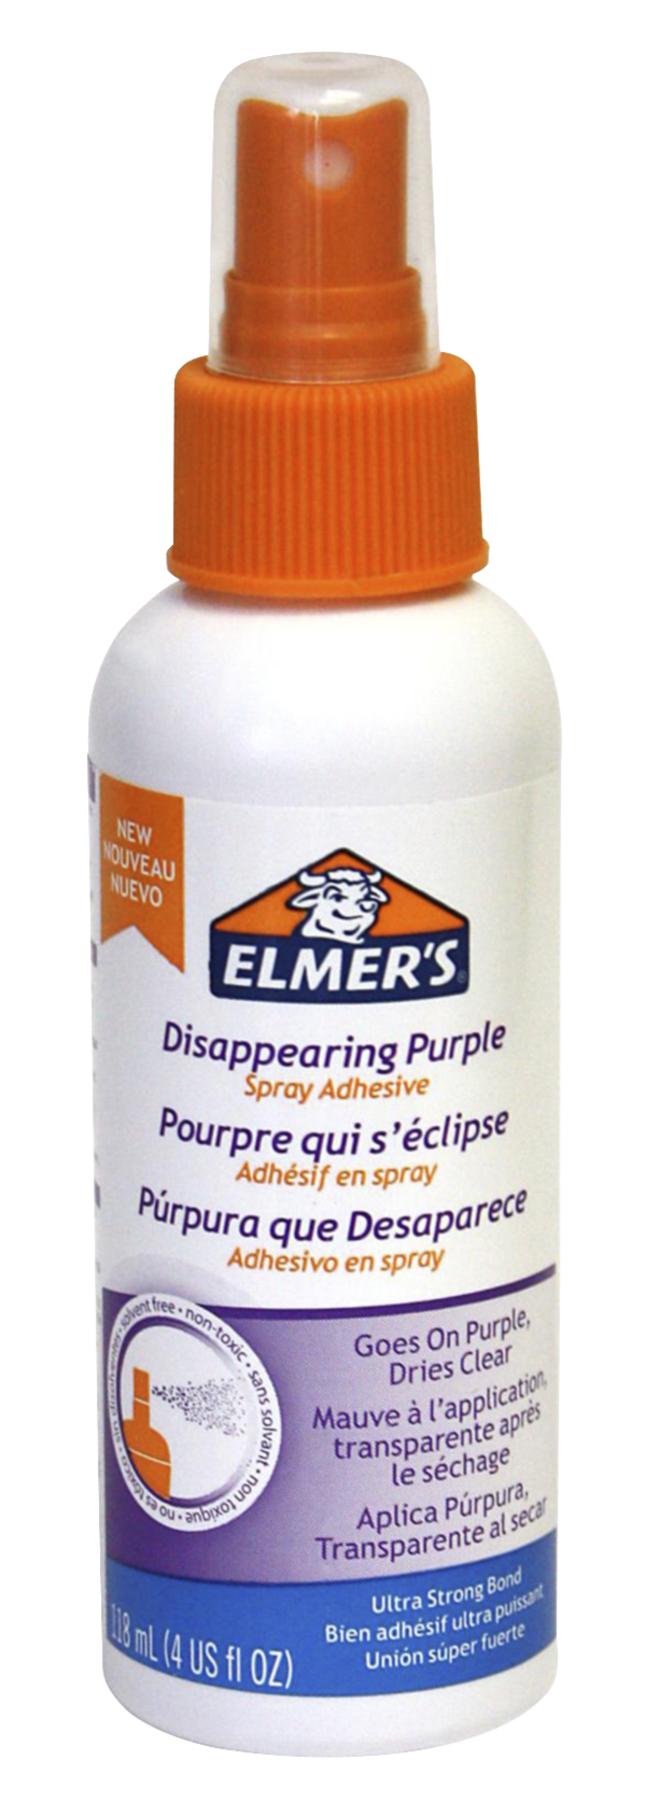 Spray Adhesive, Item Number 2004795